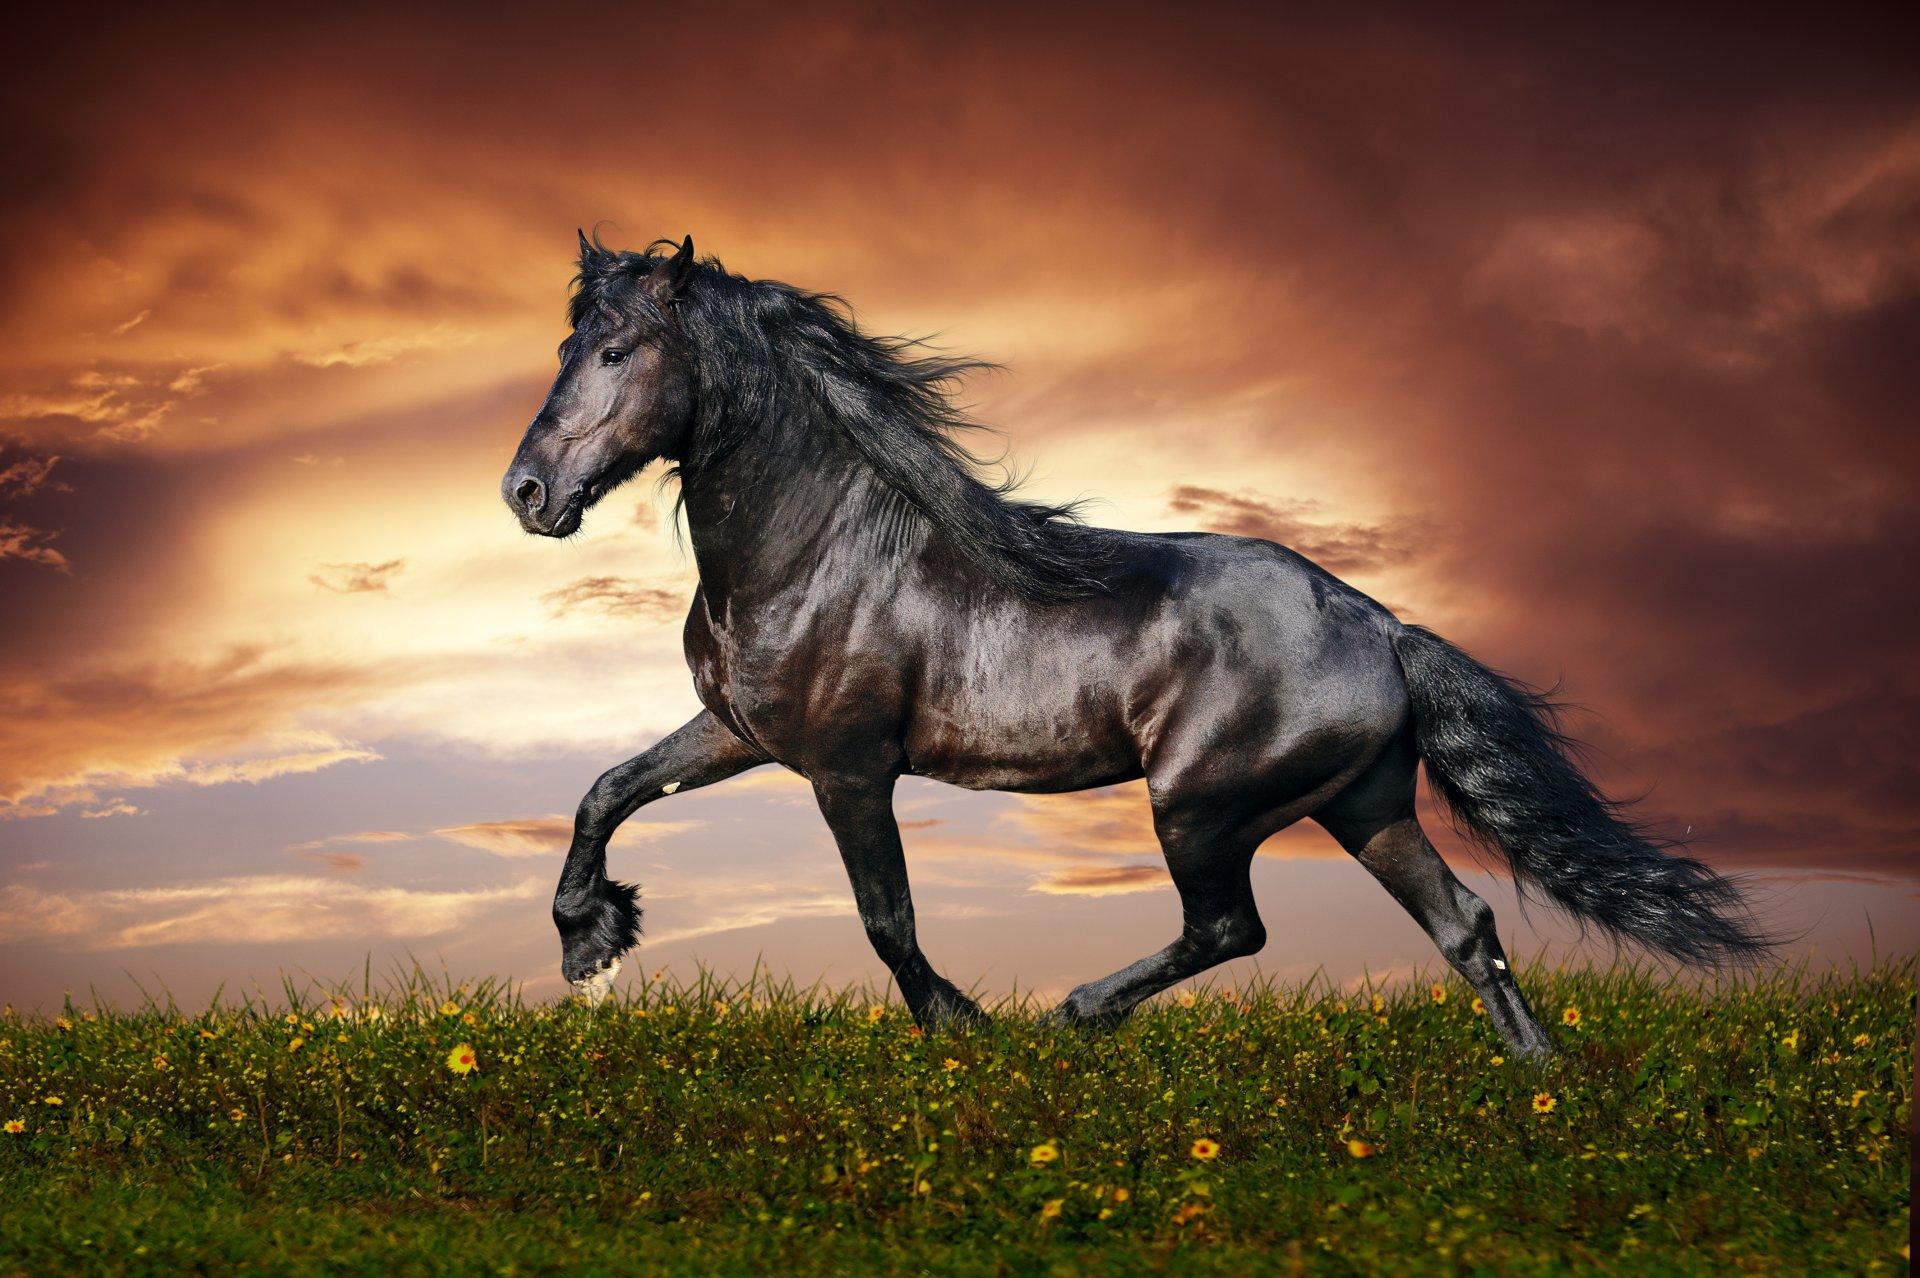 Картинки с лошадьми на компьютер, картинки торт поздравления